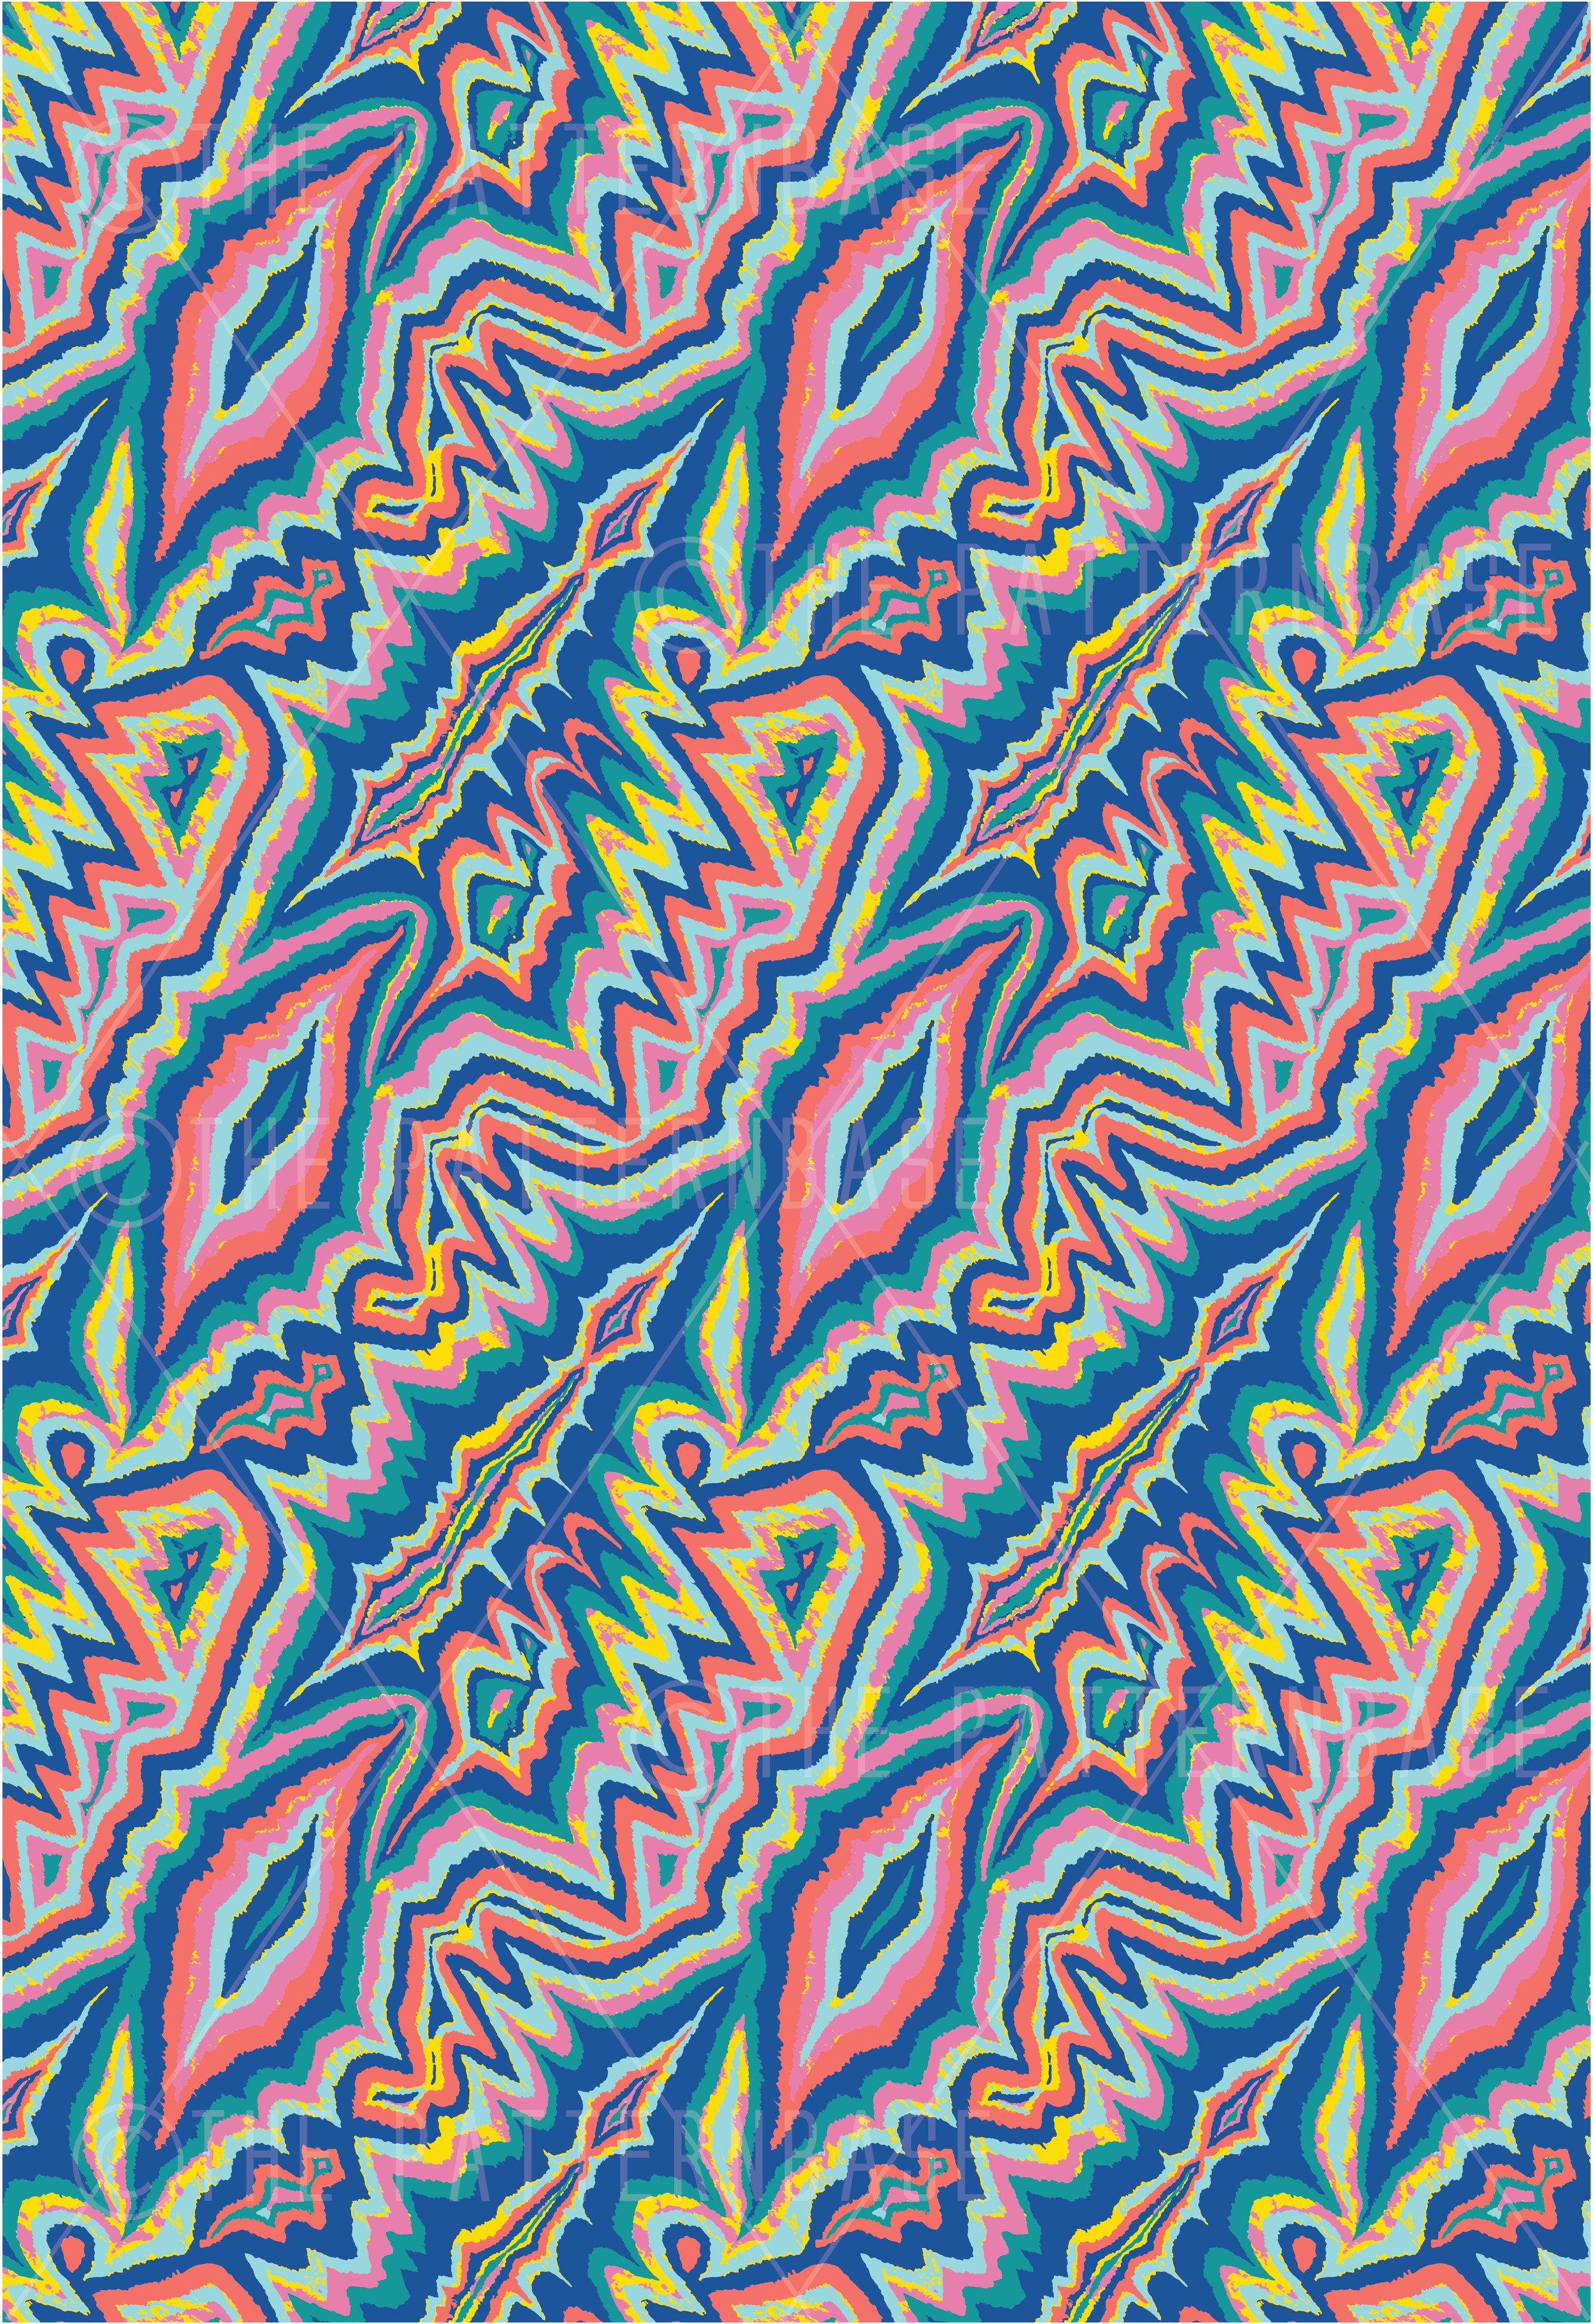 patternbase-agate-blue-wm.jpg